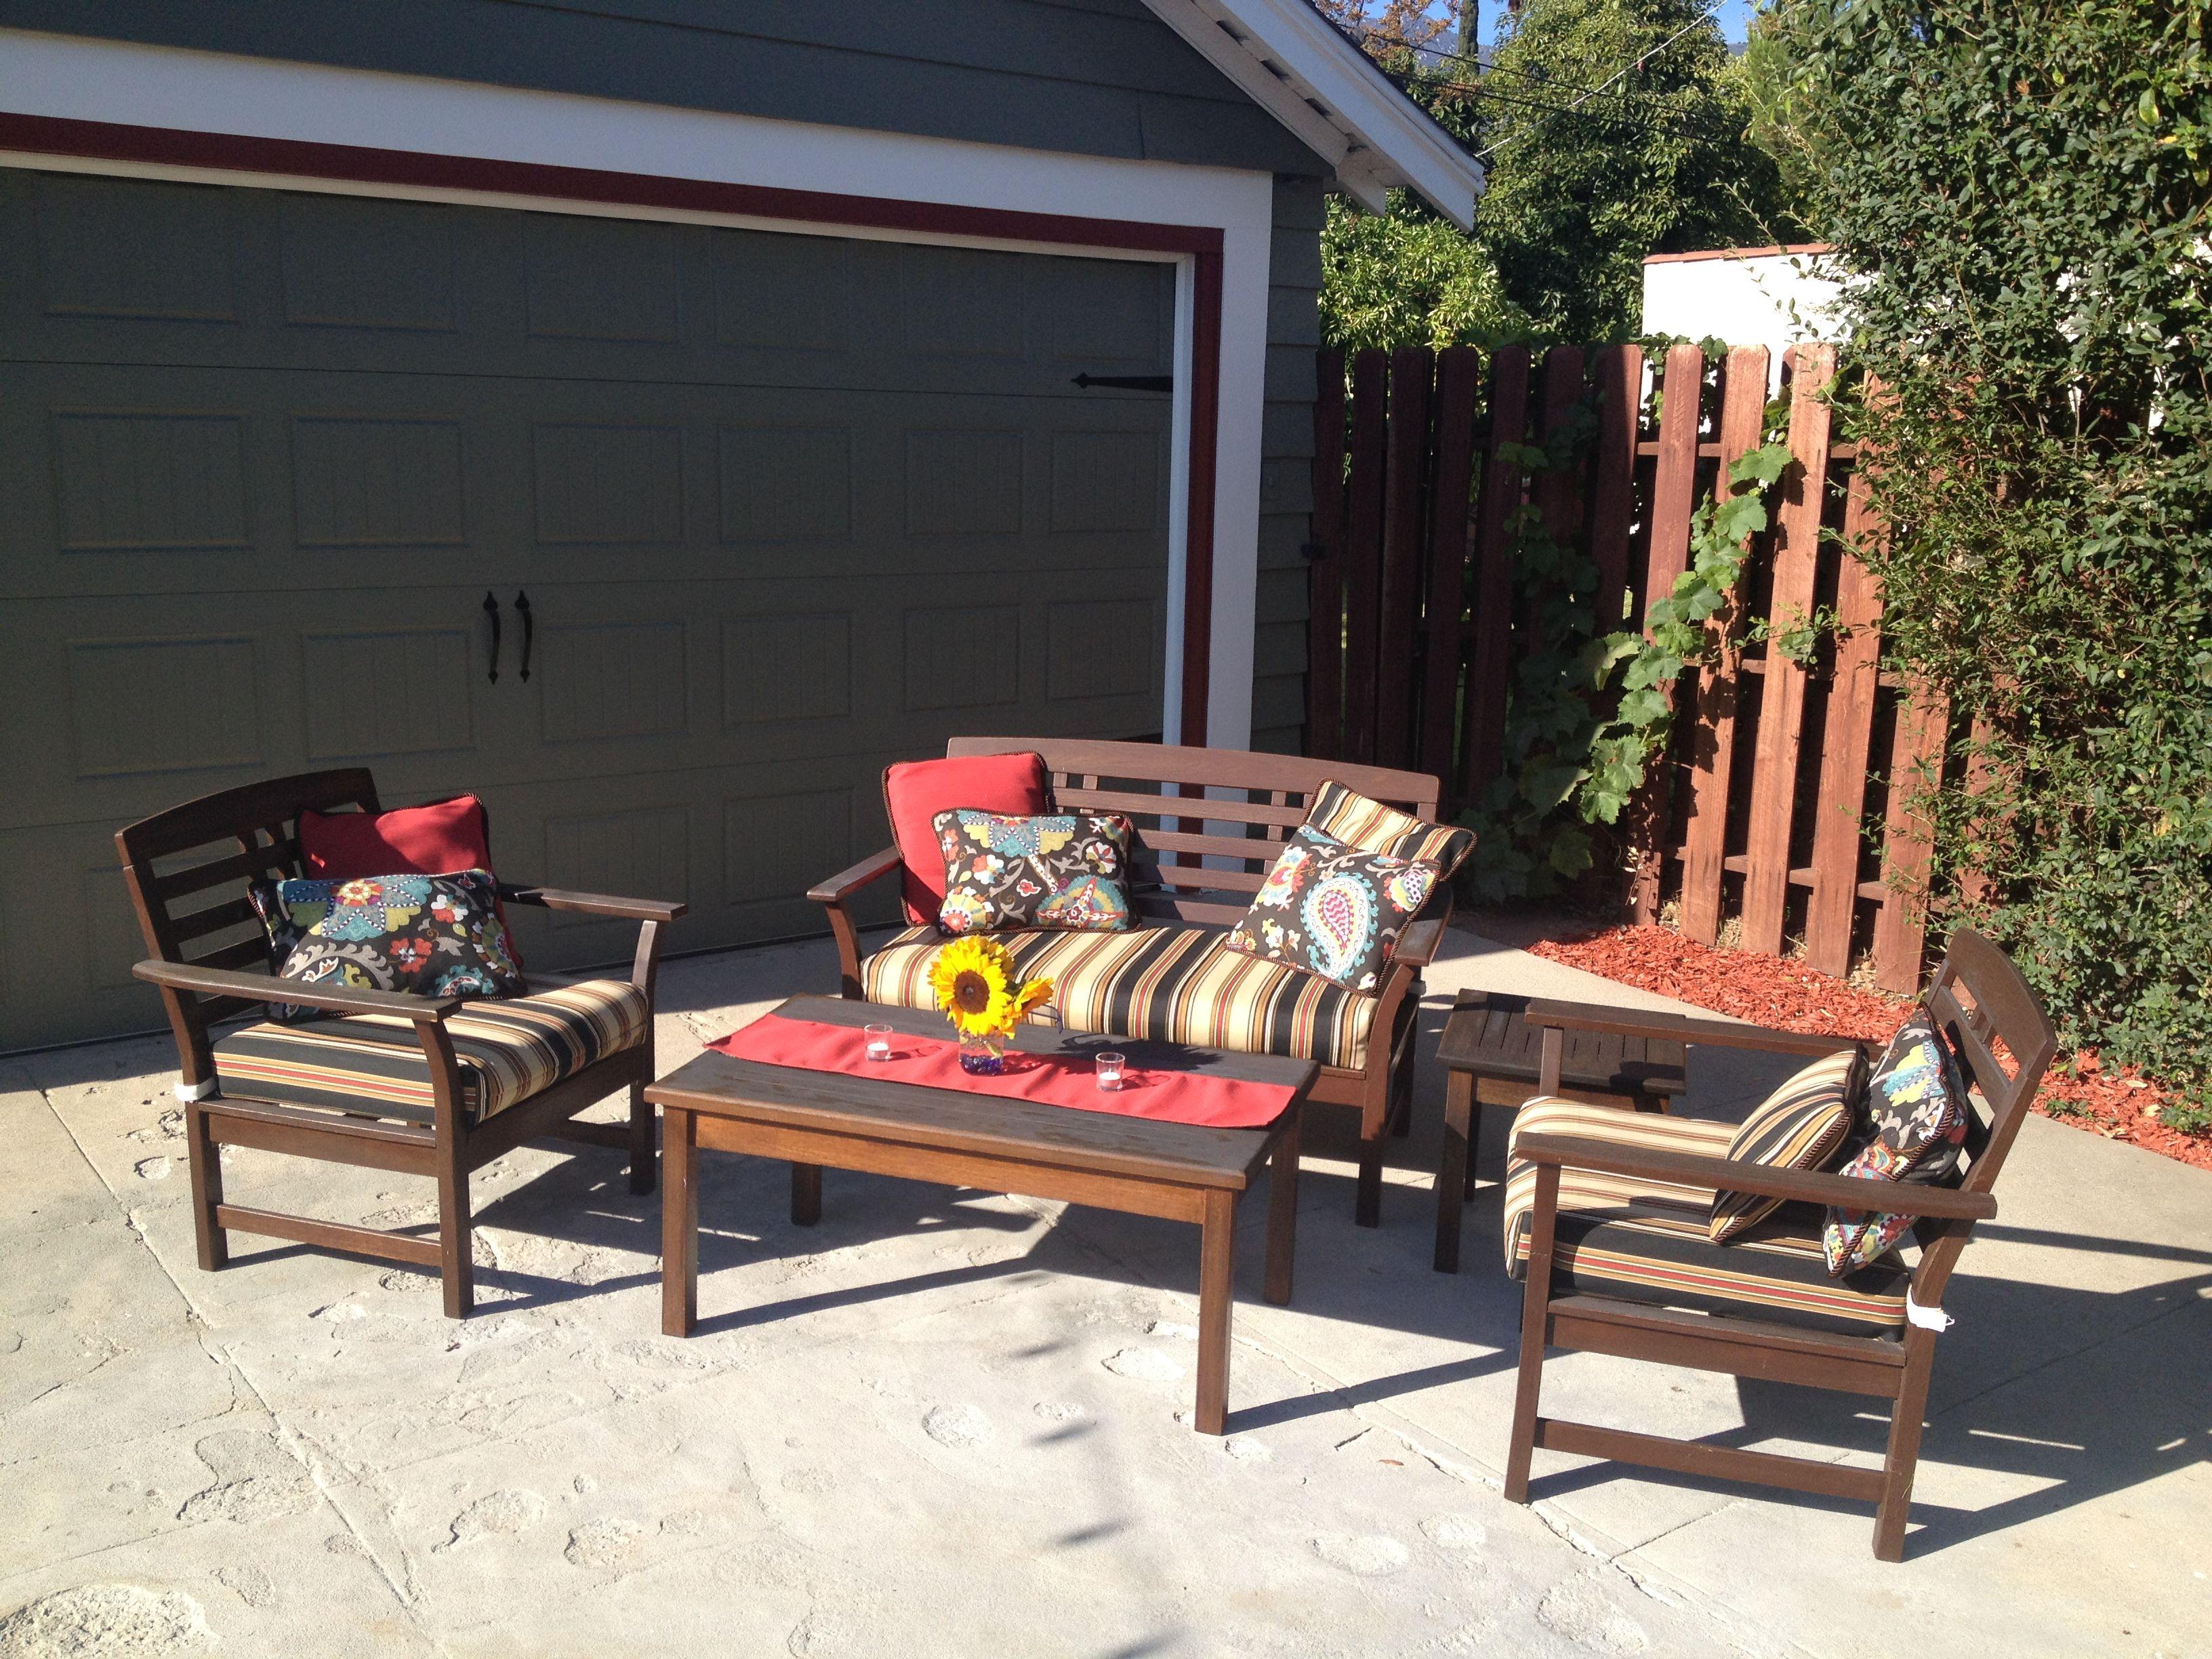 Diy outdoor cushions pillows table runner outdoor